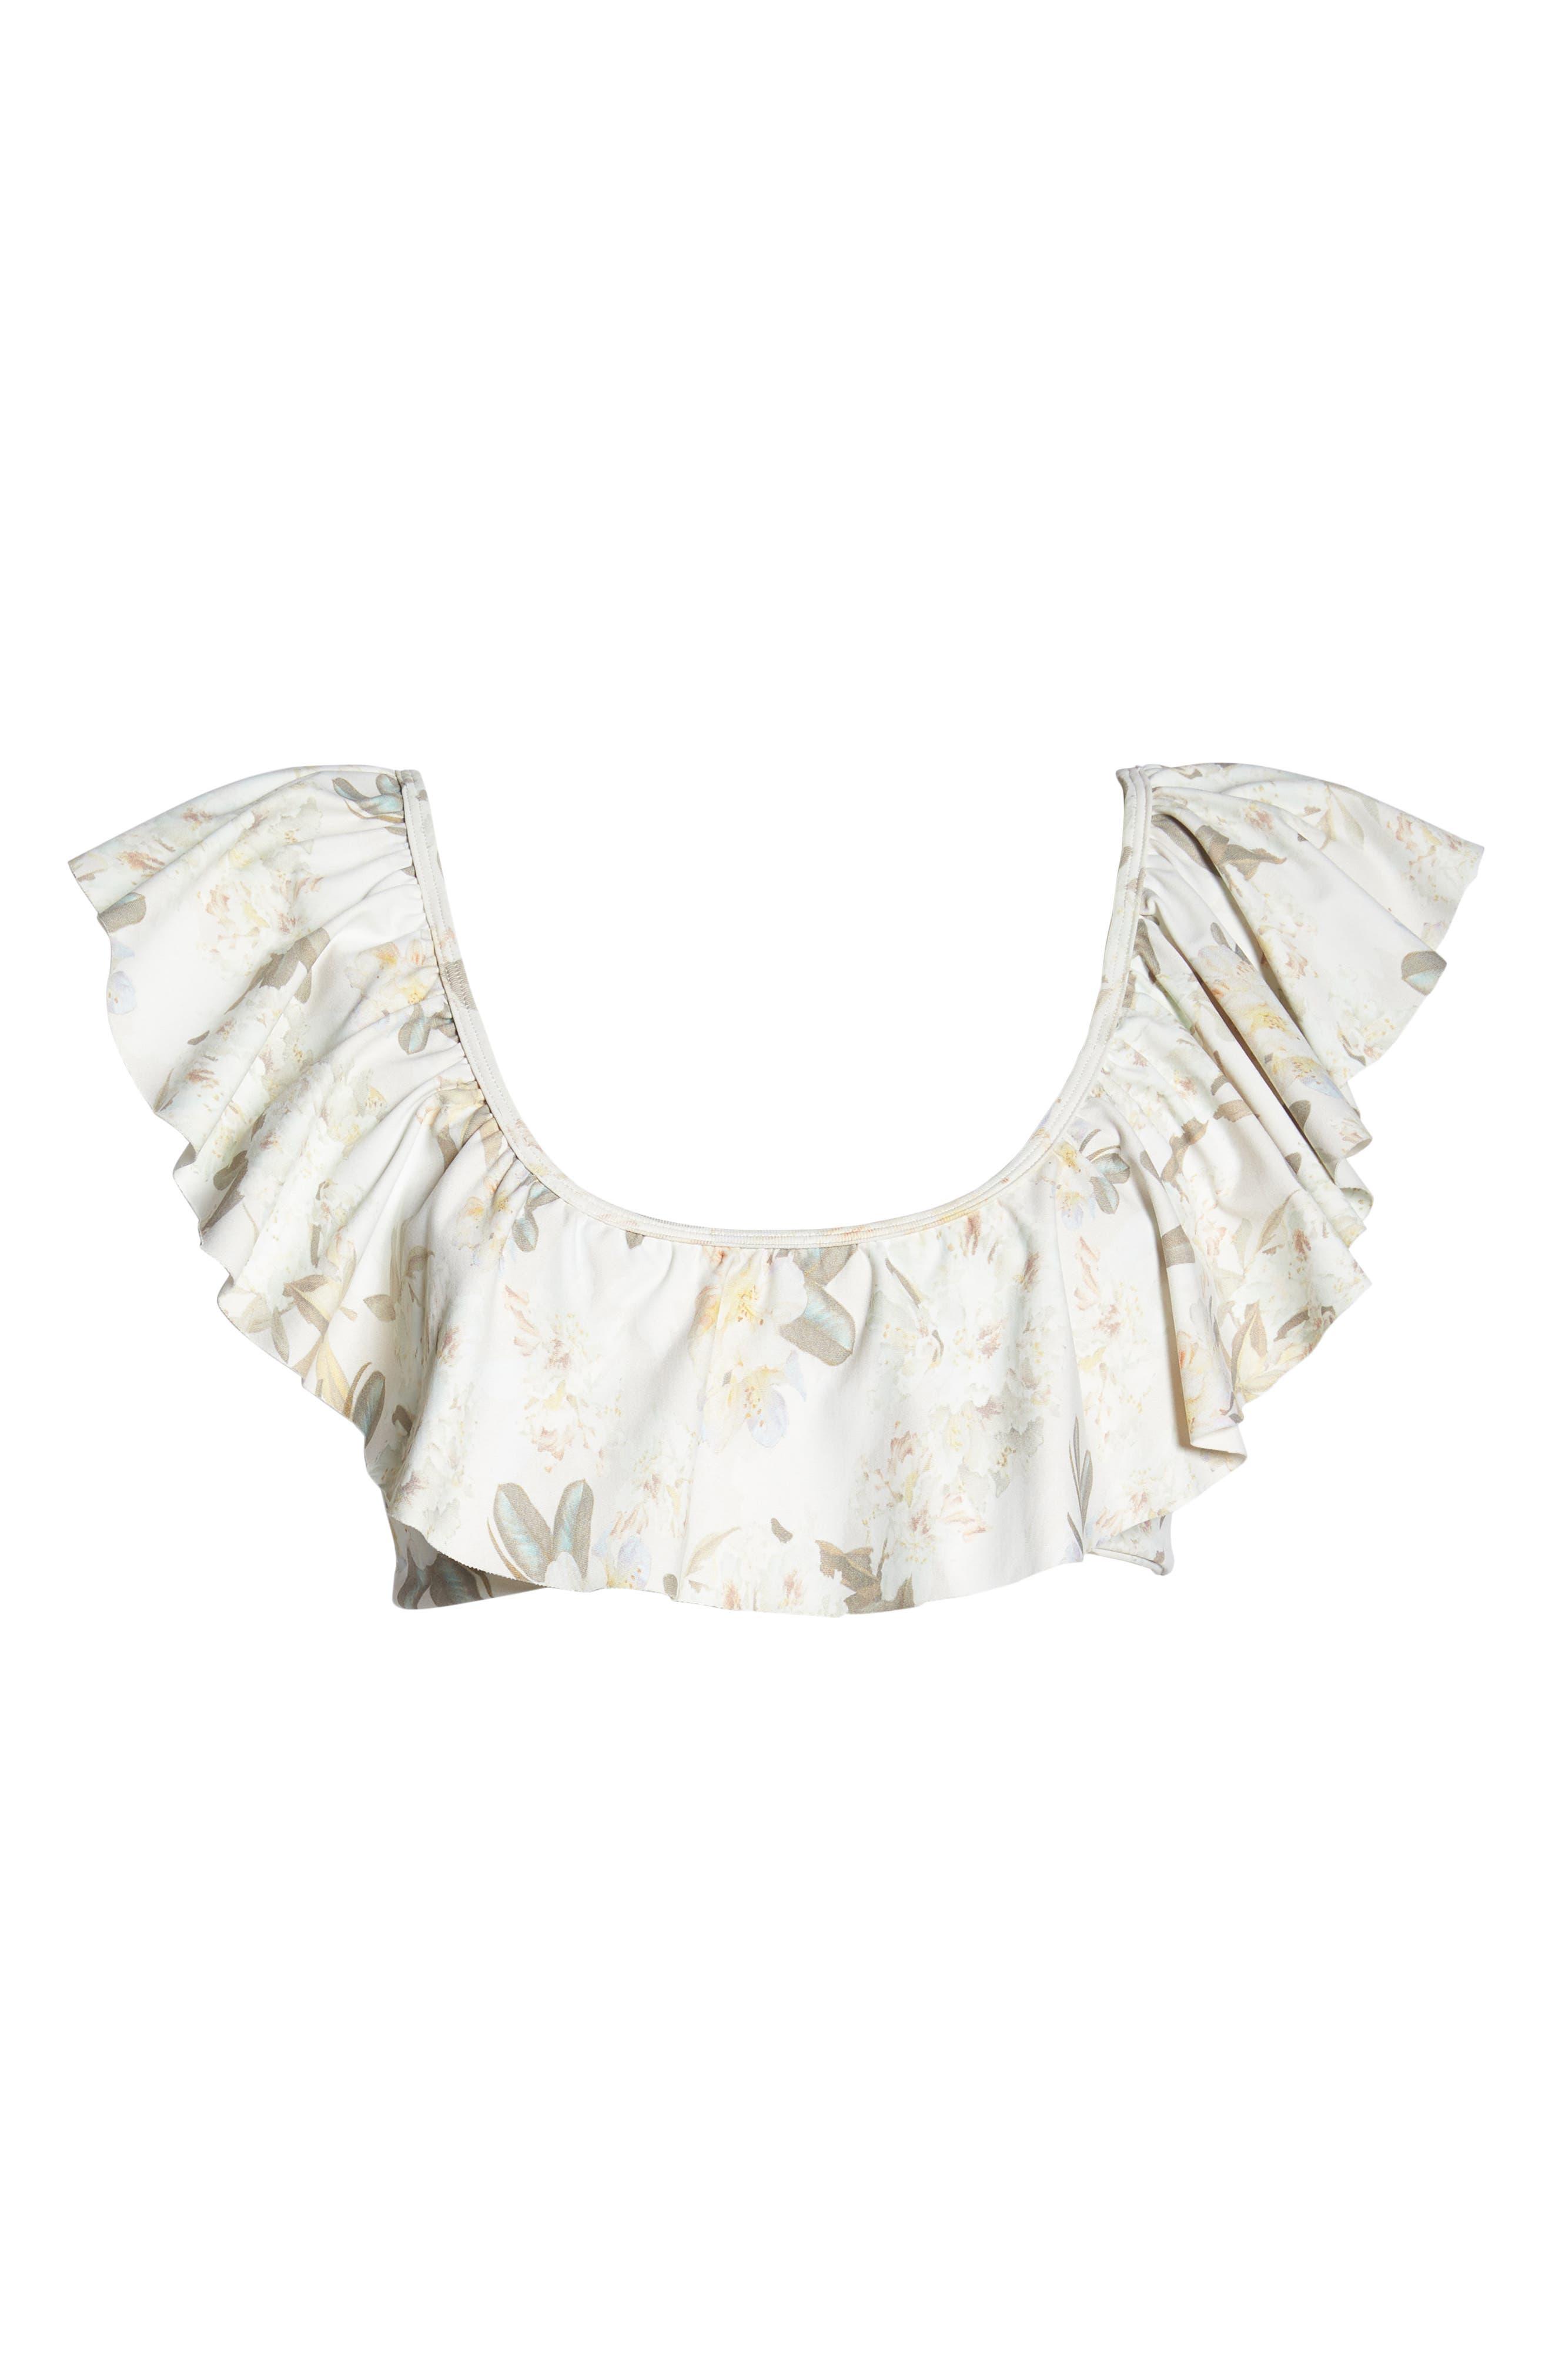 Sandrita Bikini Top,                             Alternate thumbnail 6, color,                             Ete Floral White